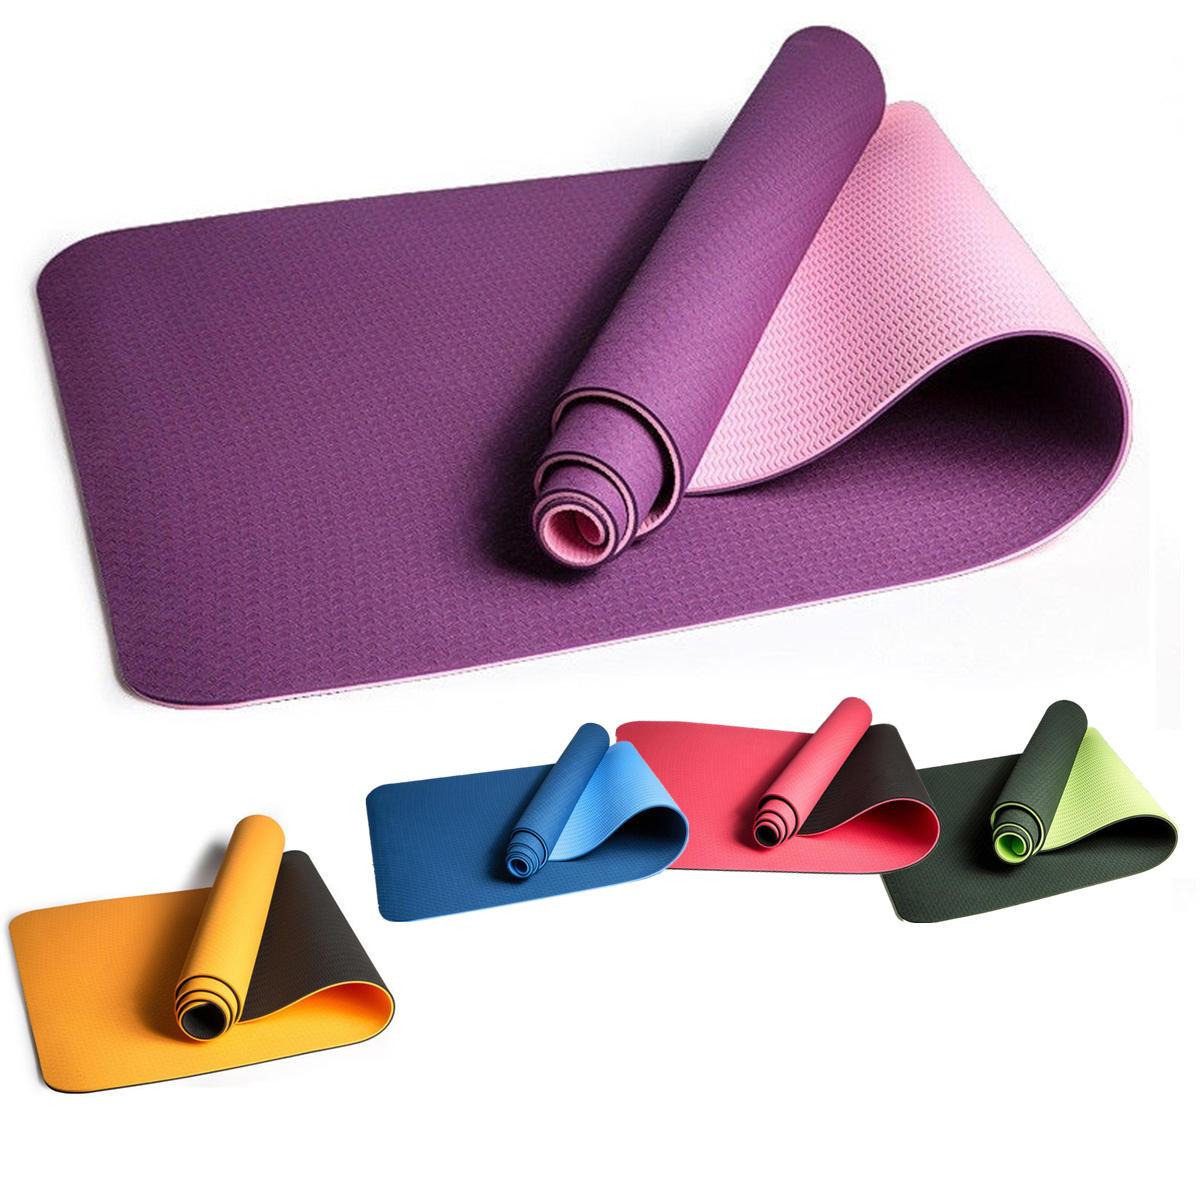 183x61x0.6cm Yoga Mat Workout Exercise Mat Gym Fitness Pilates Non-Slip Mats TPE